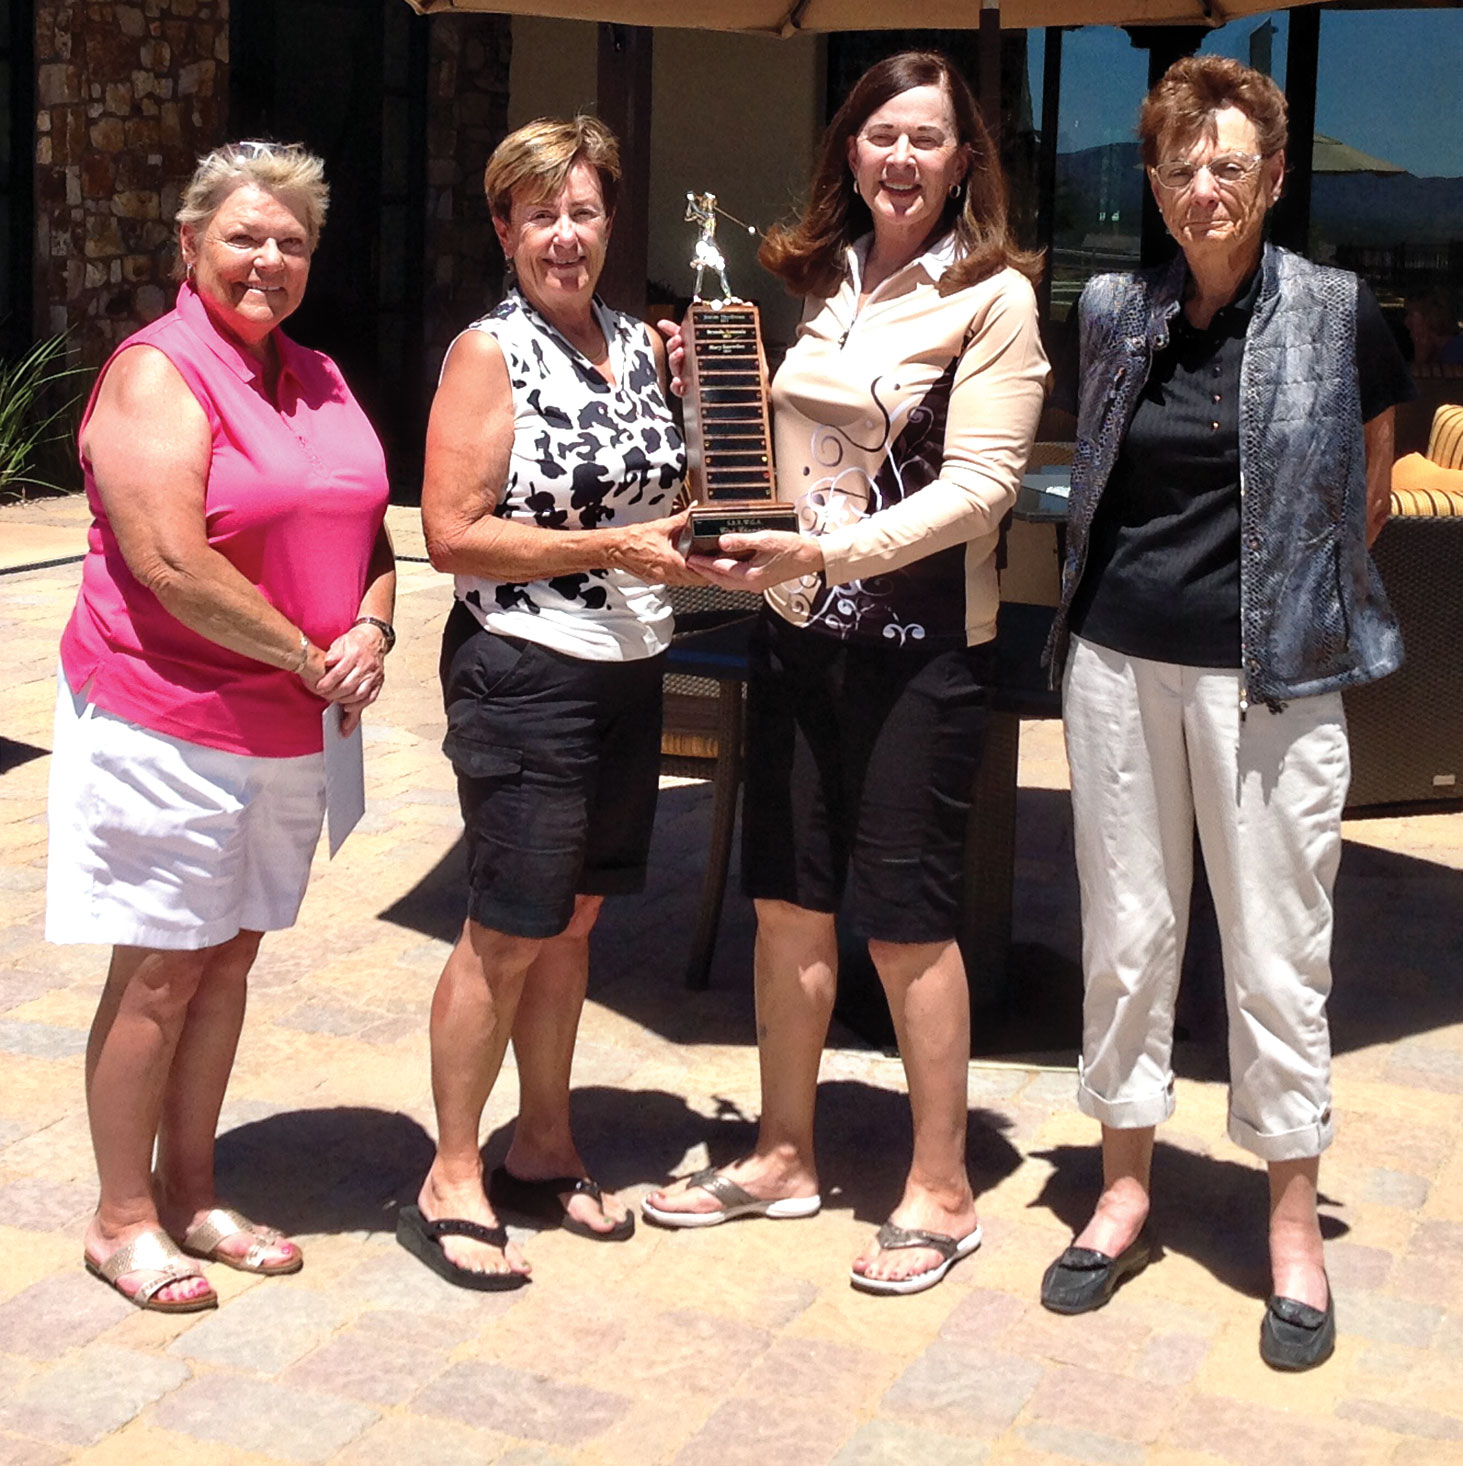 Left to right: Charlene Culver; Mary Snowden, club champion; Brenda Armenia, president; and June Nichols